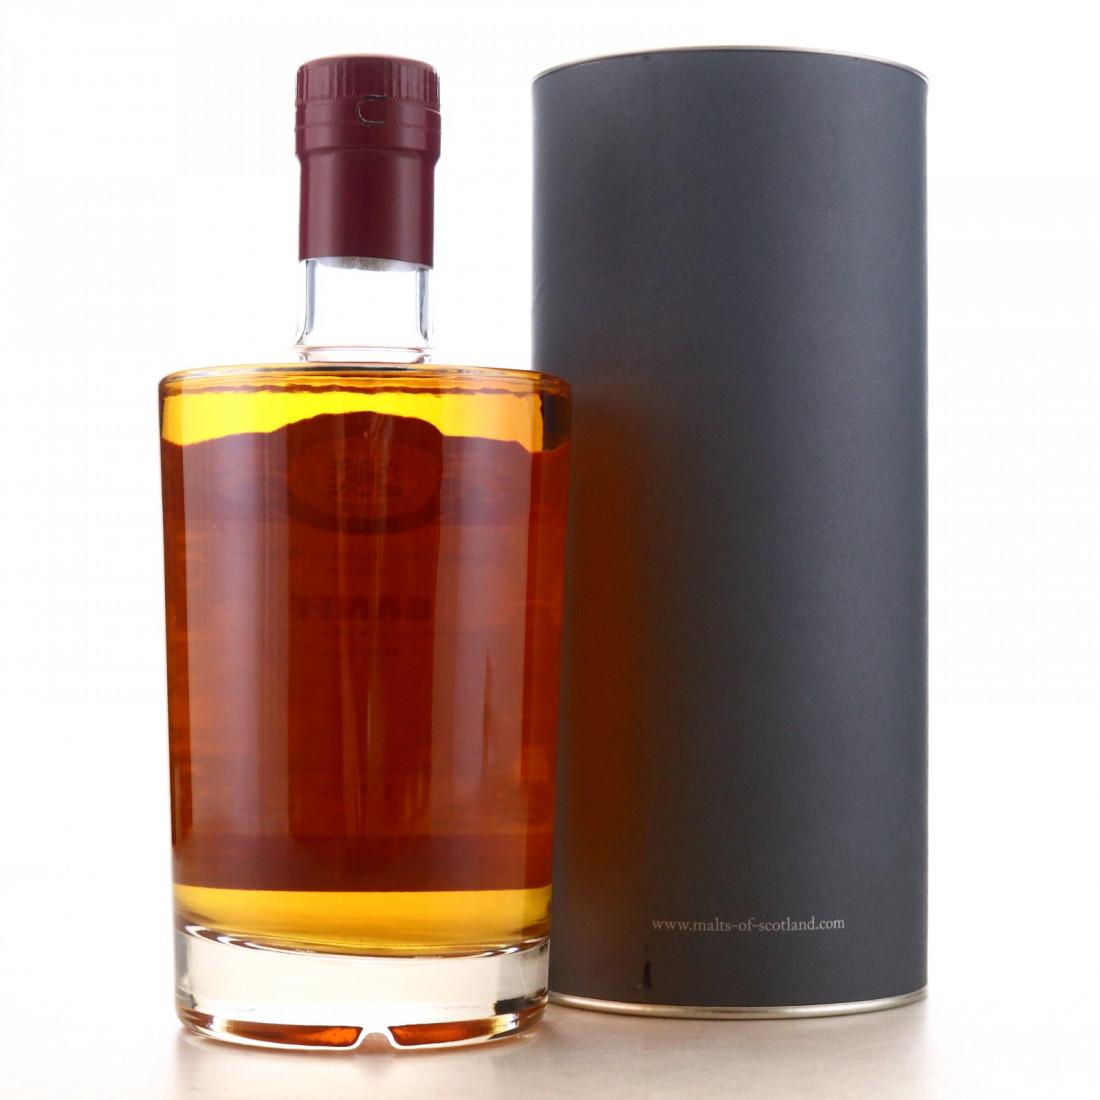 Banff 1975 Malts of Scotland Bourbon Barrel